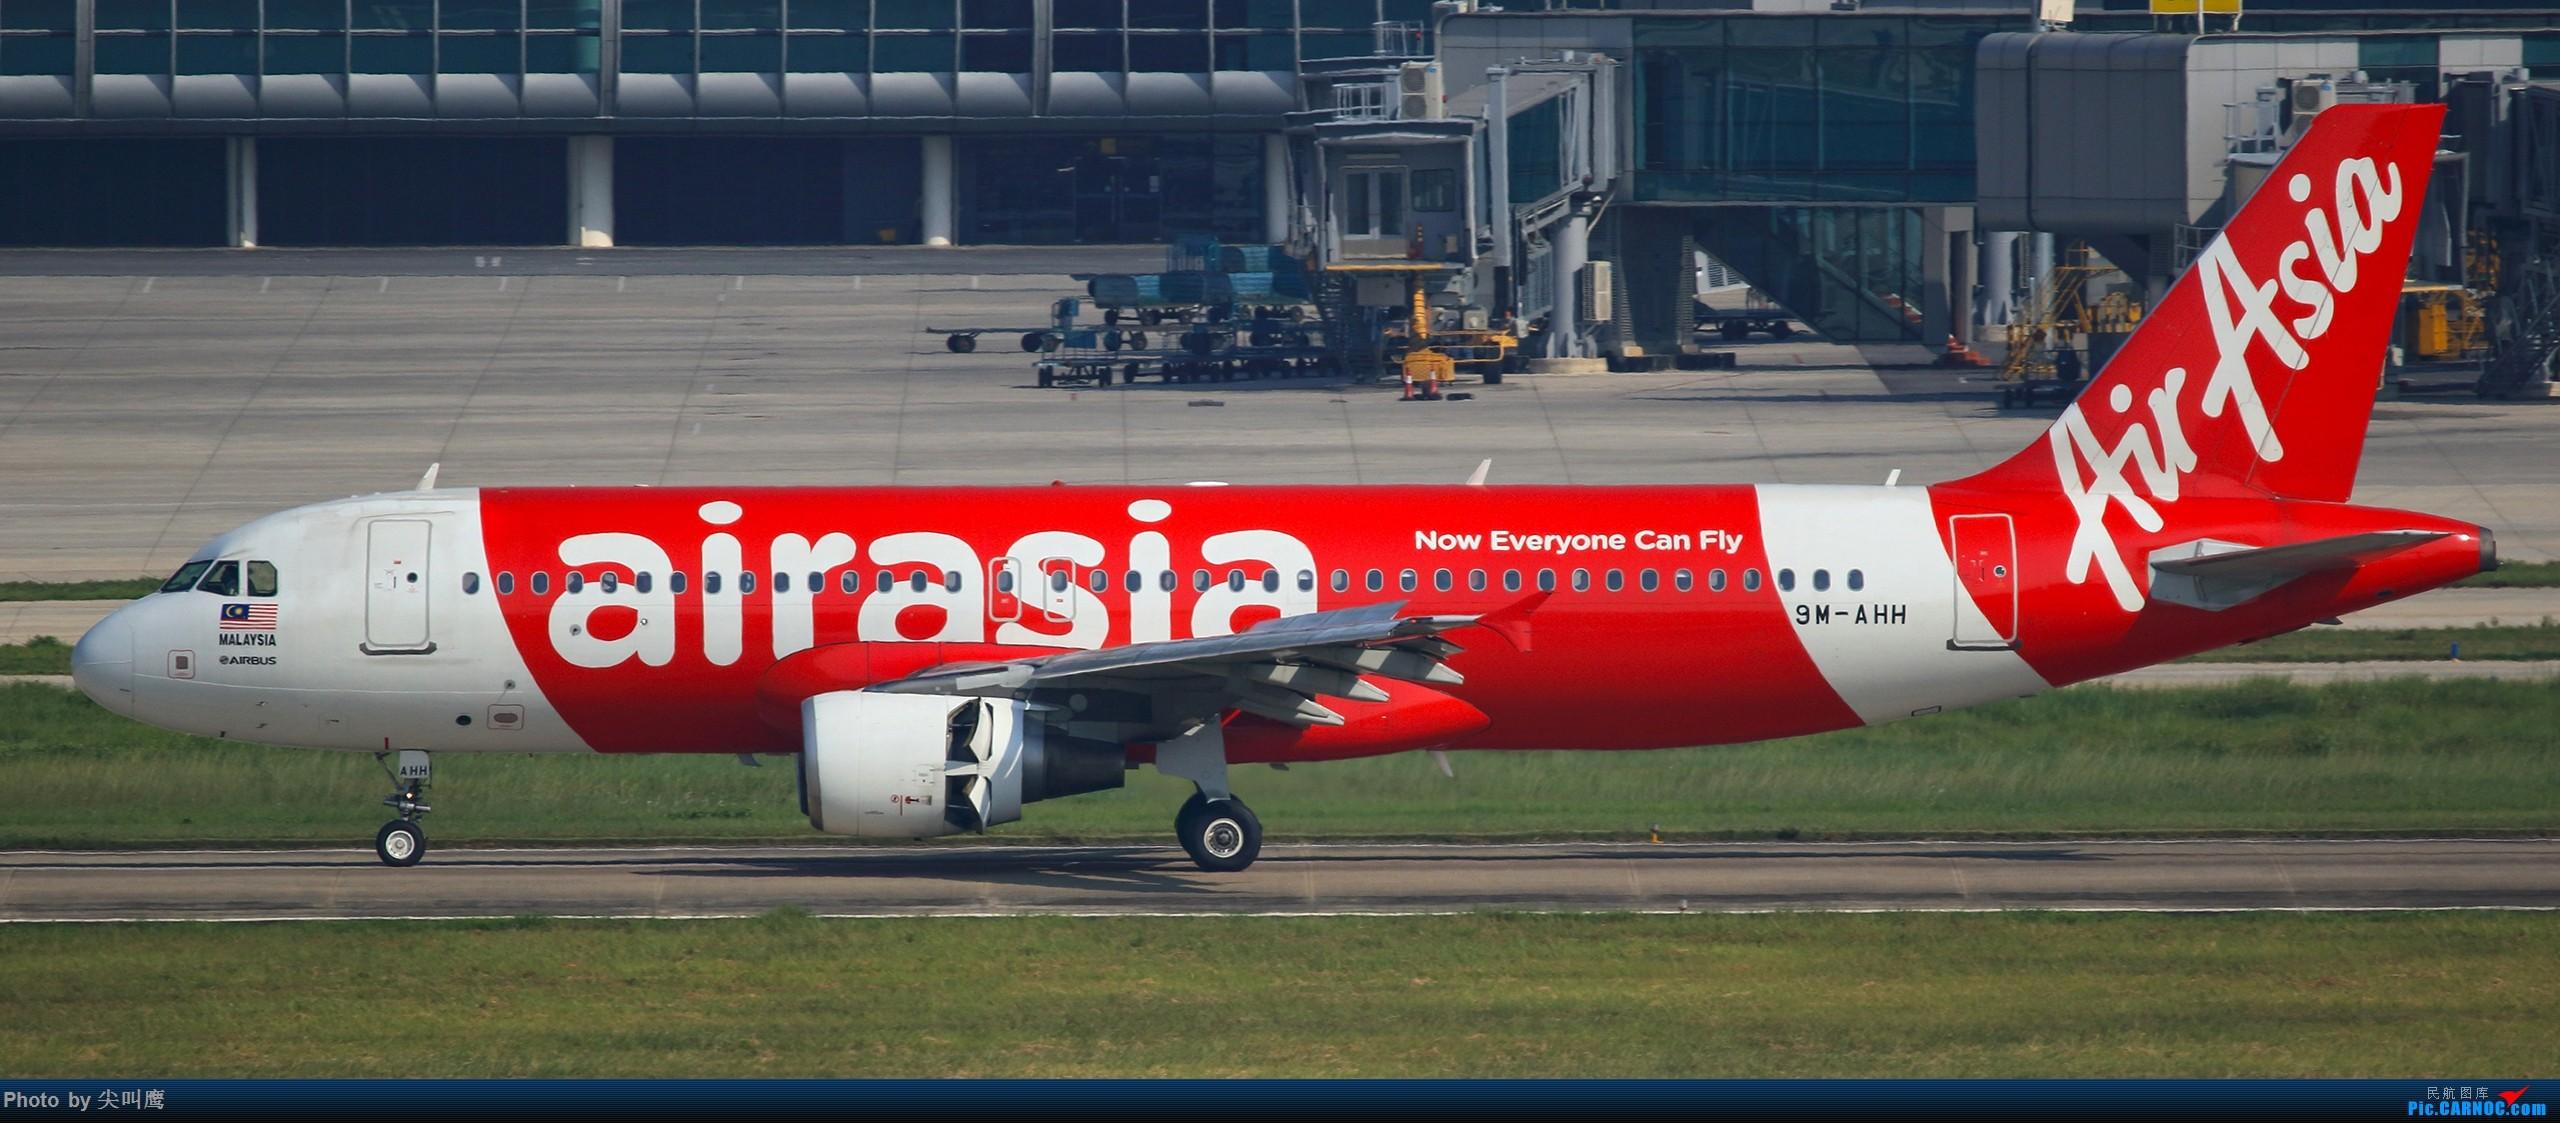 Re:[原创]NNG的亚航小合集 AIRBUS A320 9M-AHH 中国南宁吴圩国际机场